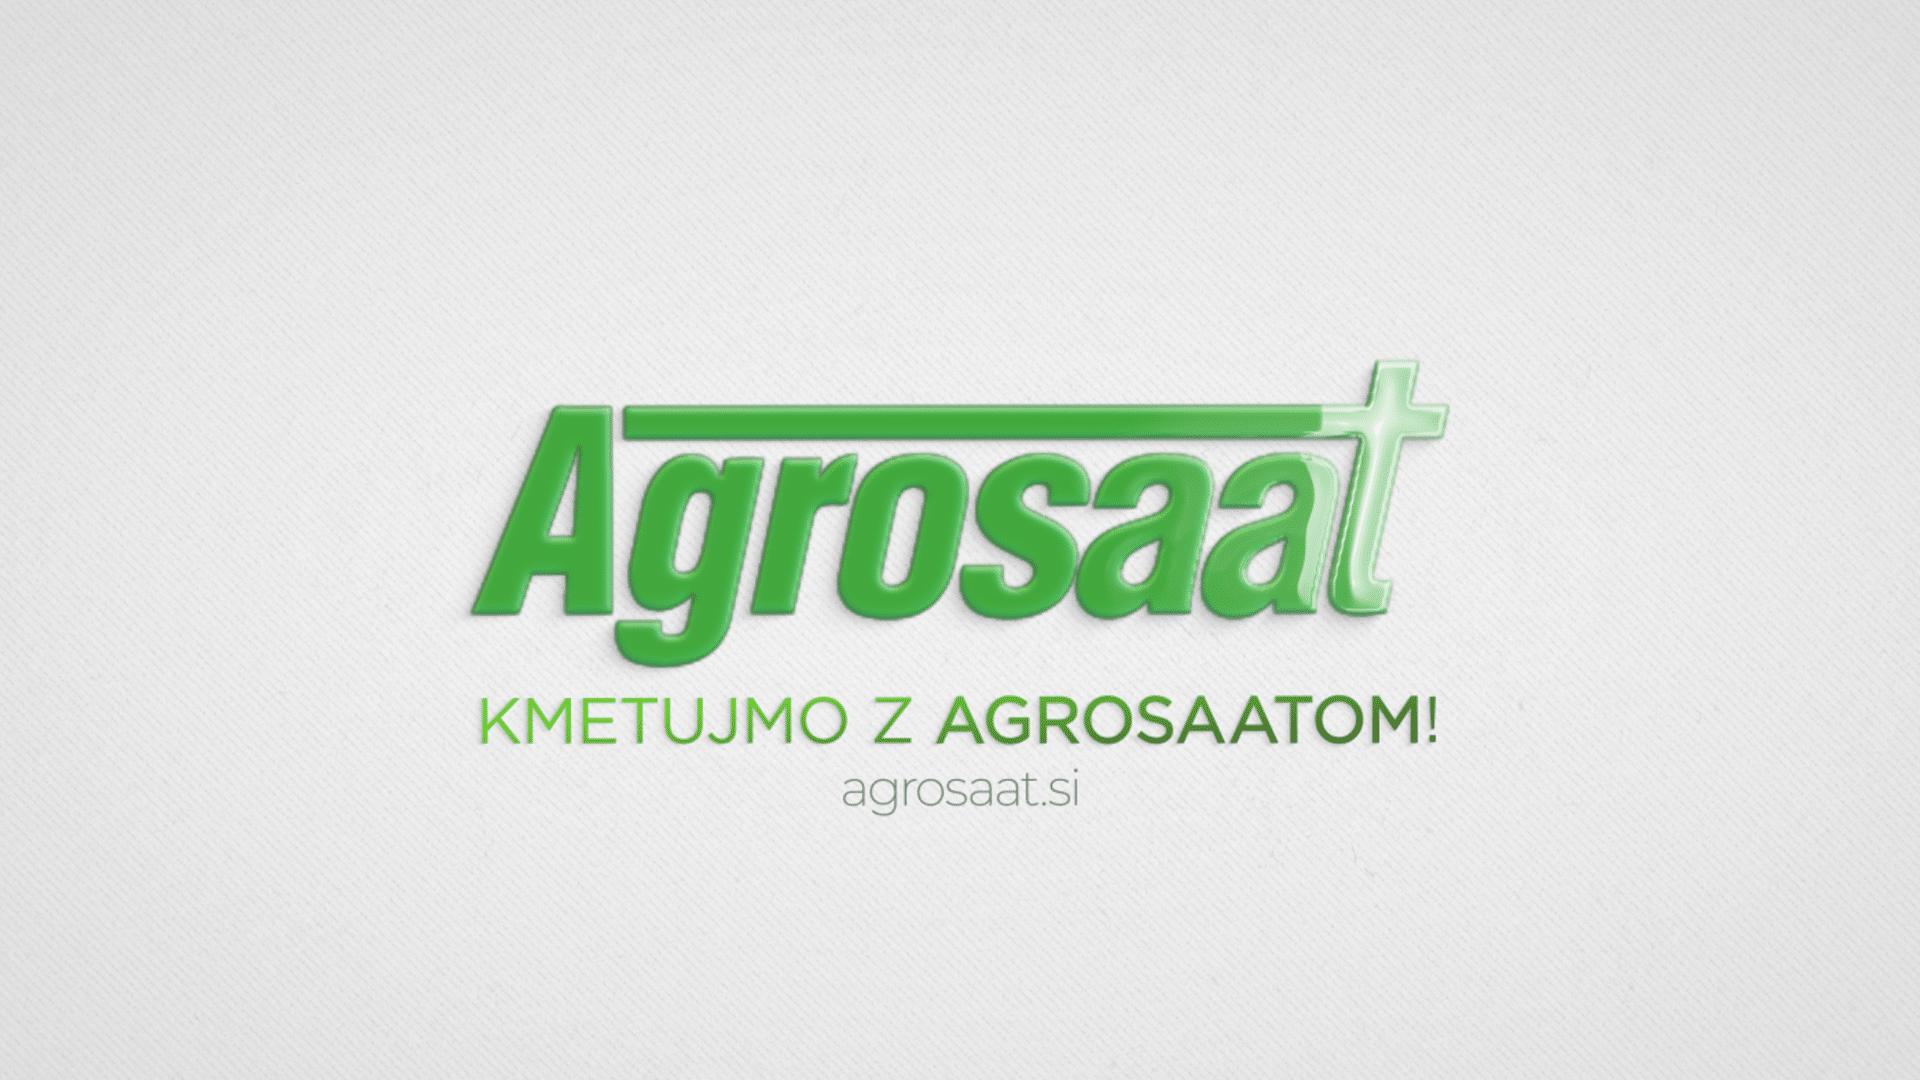 agrosaat_thmb